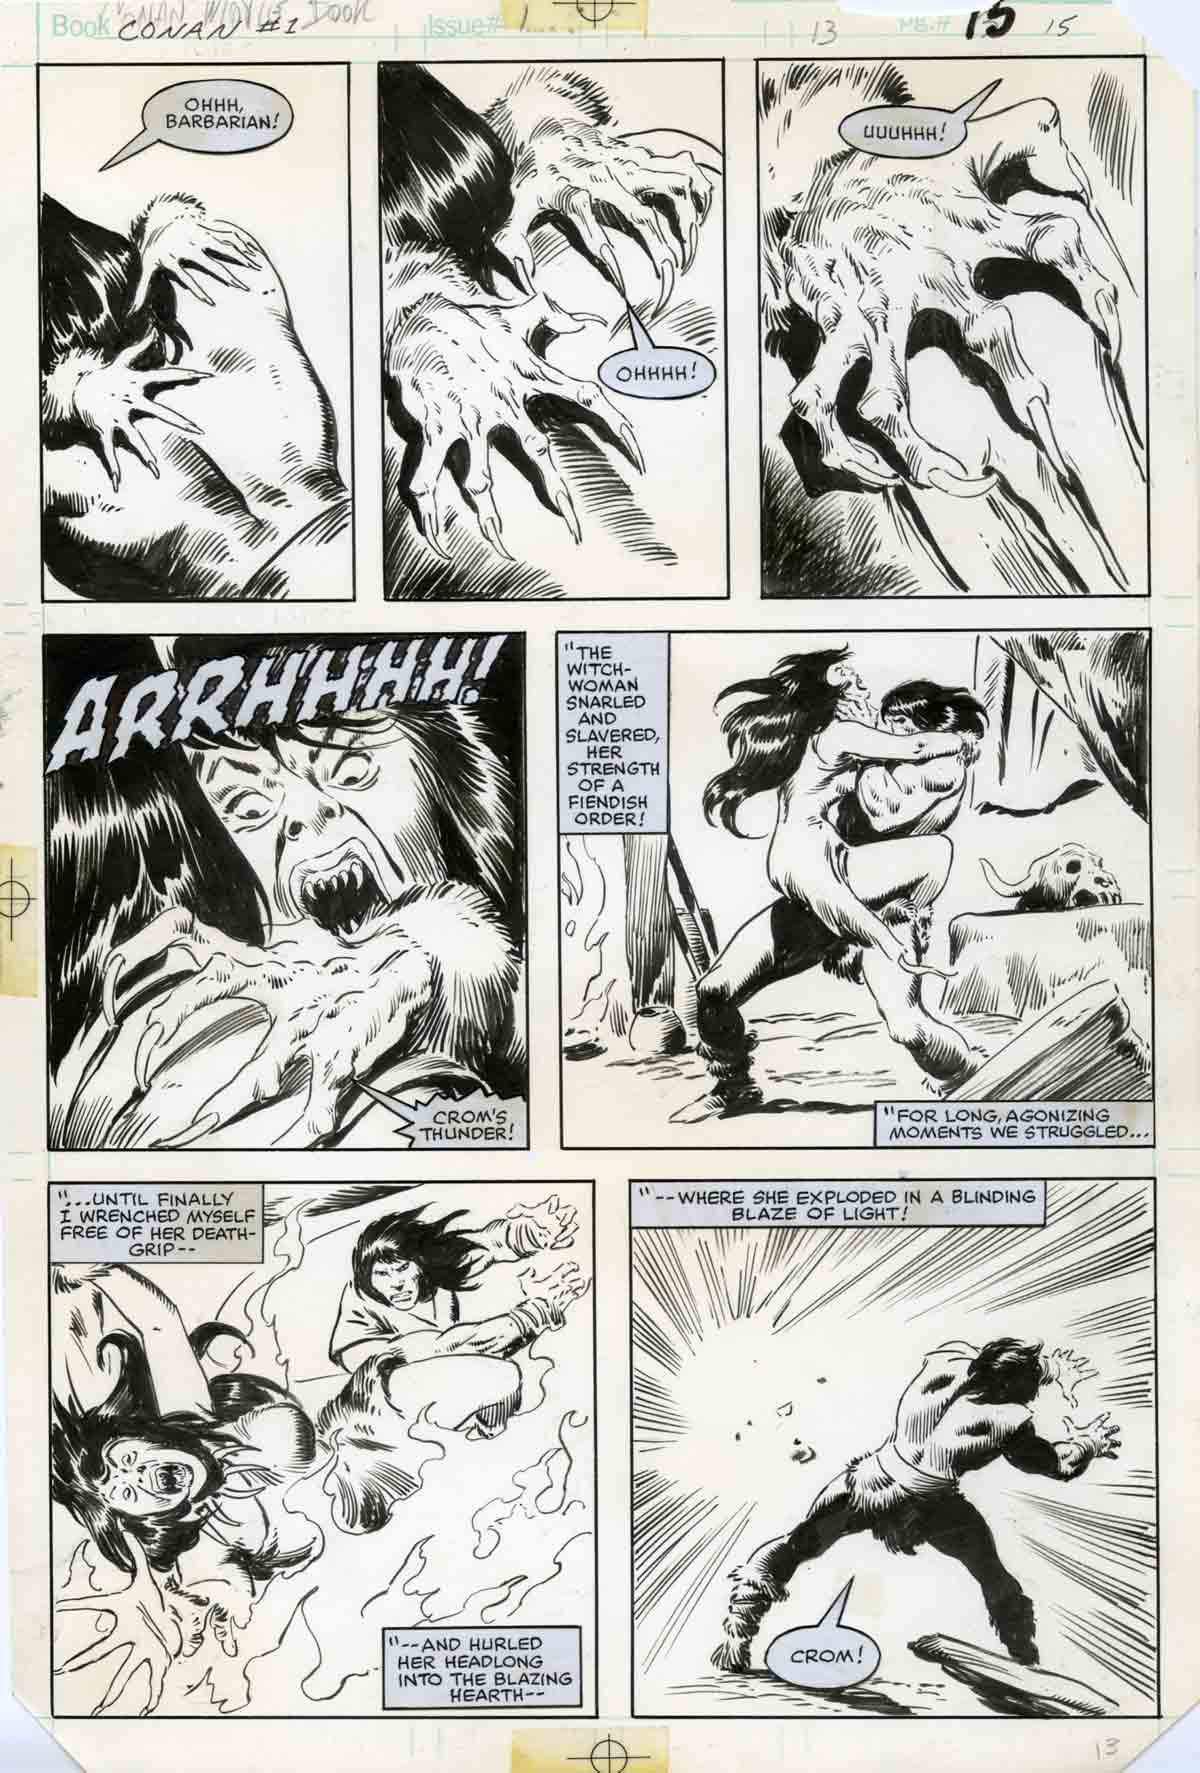 Golem-Comics-La-espada-salvaje-de-conan-el-barbaro-la-llegada-de-conan-04